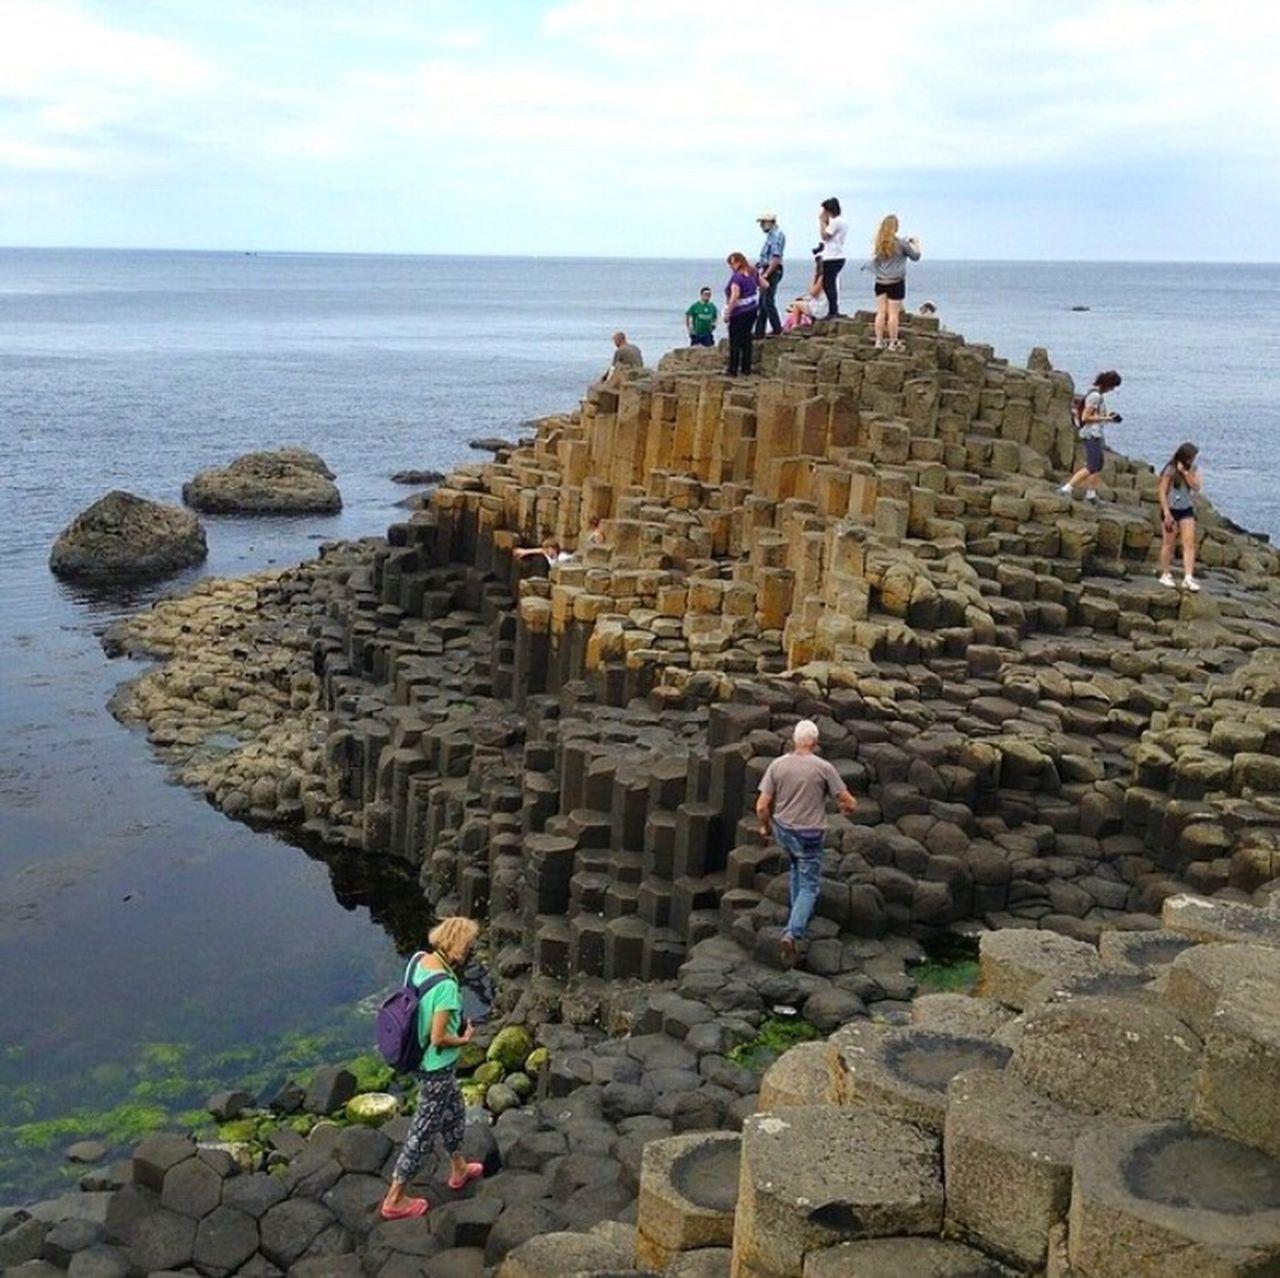 Giant's Causeway Basalt Columns County Antrim Ireland🍀 Nature Amazing View Inspirational Nature's Wonder Nature's Beauty Travel